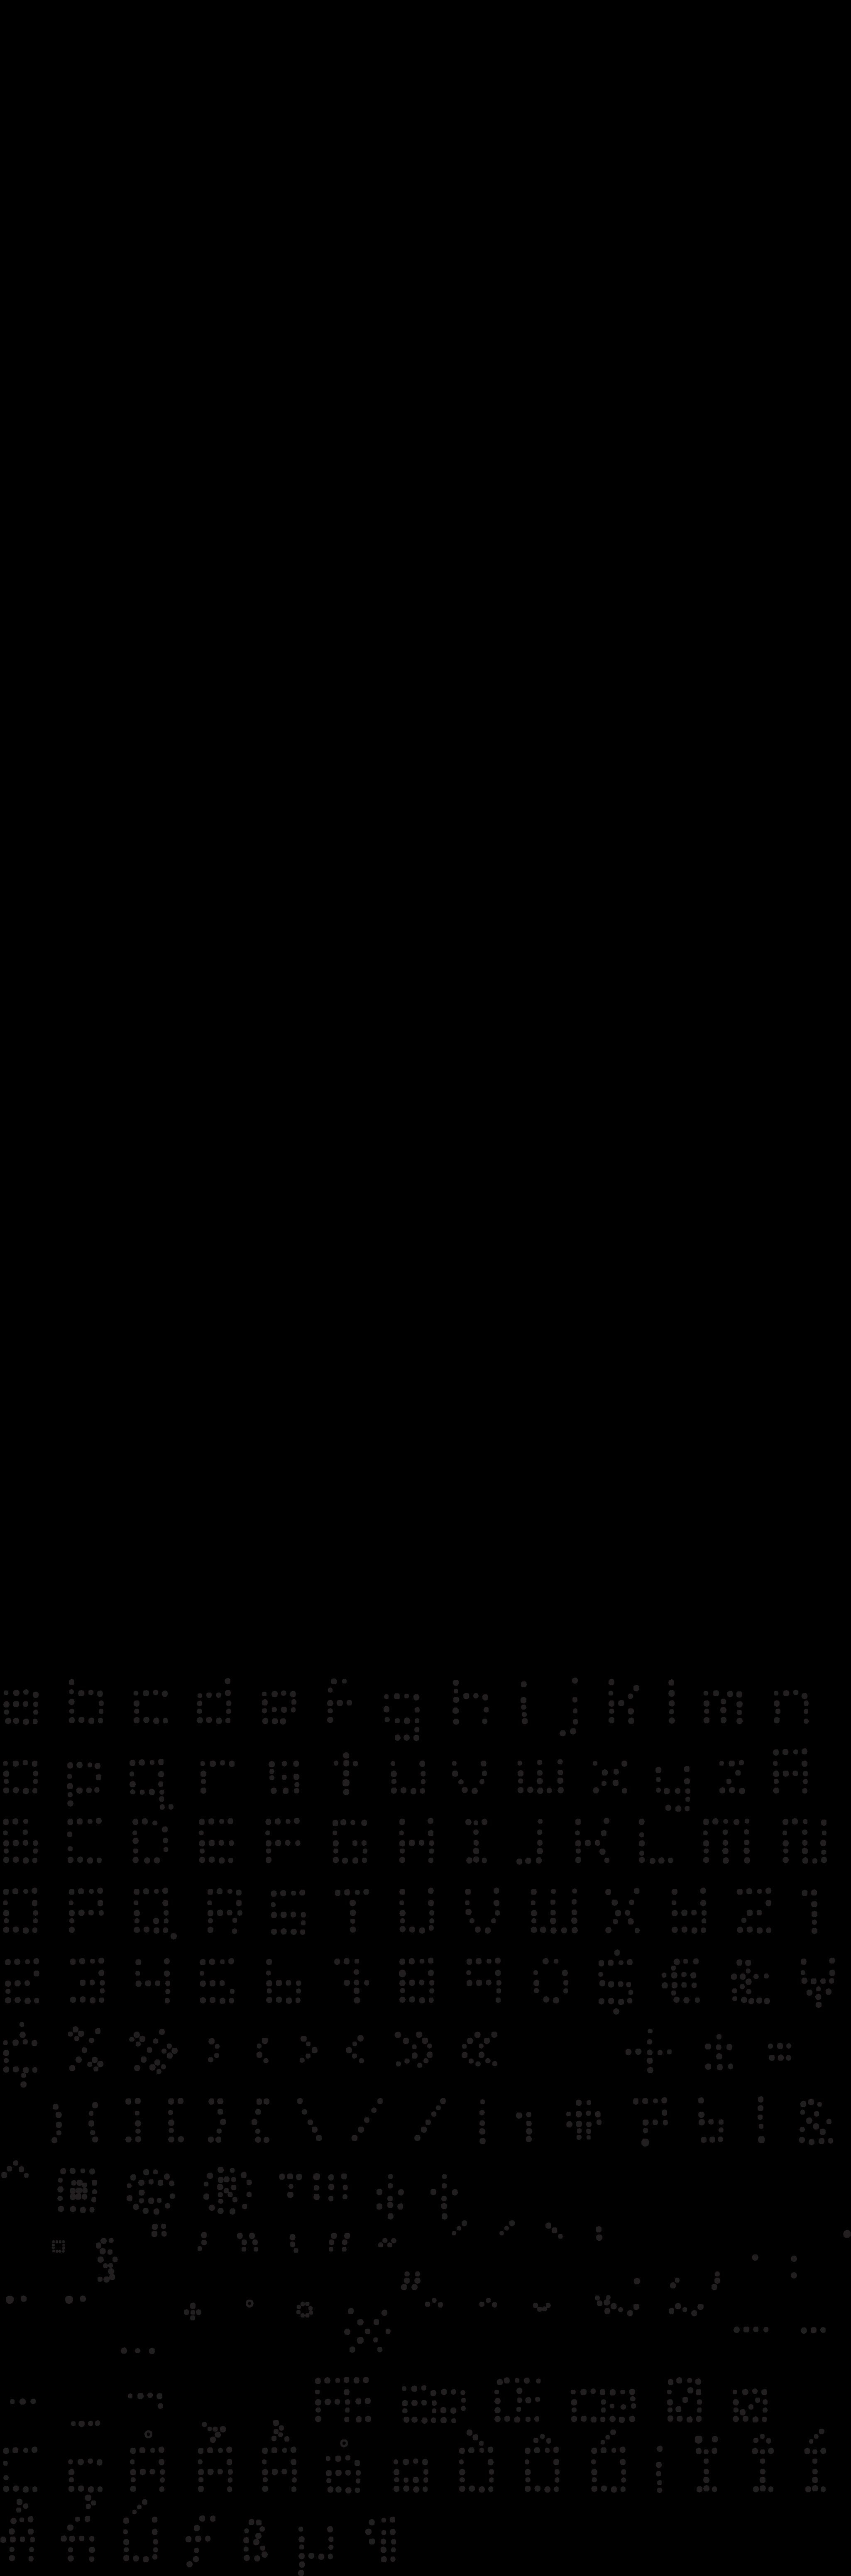 Dinkydot_12-billboard